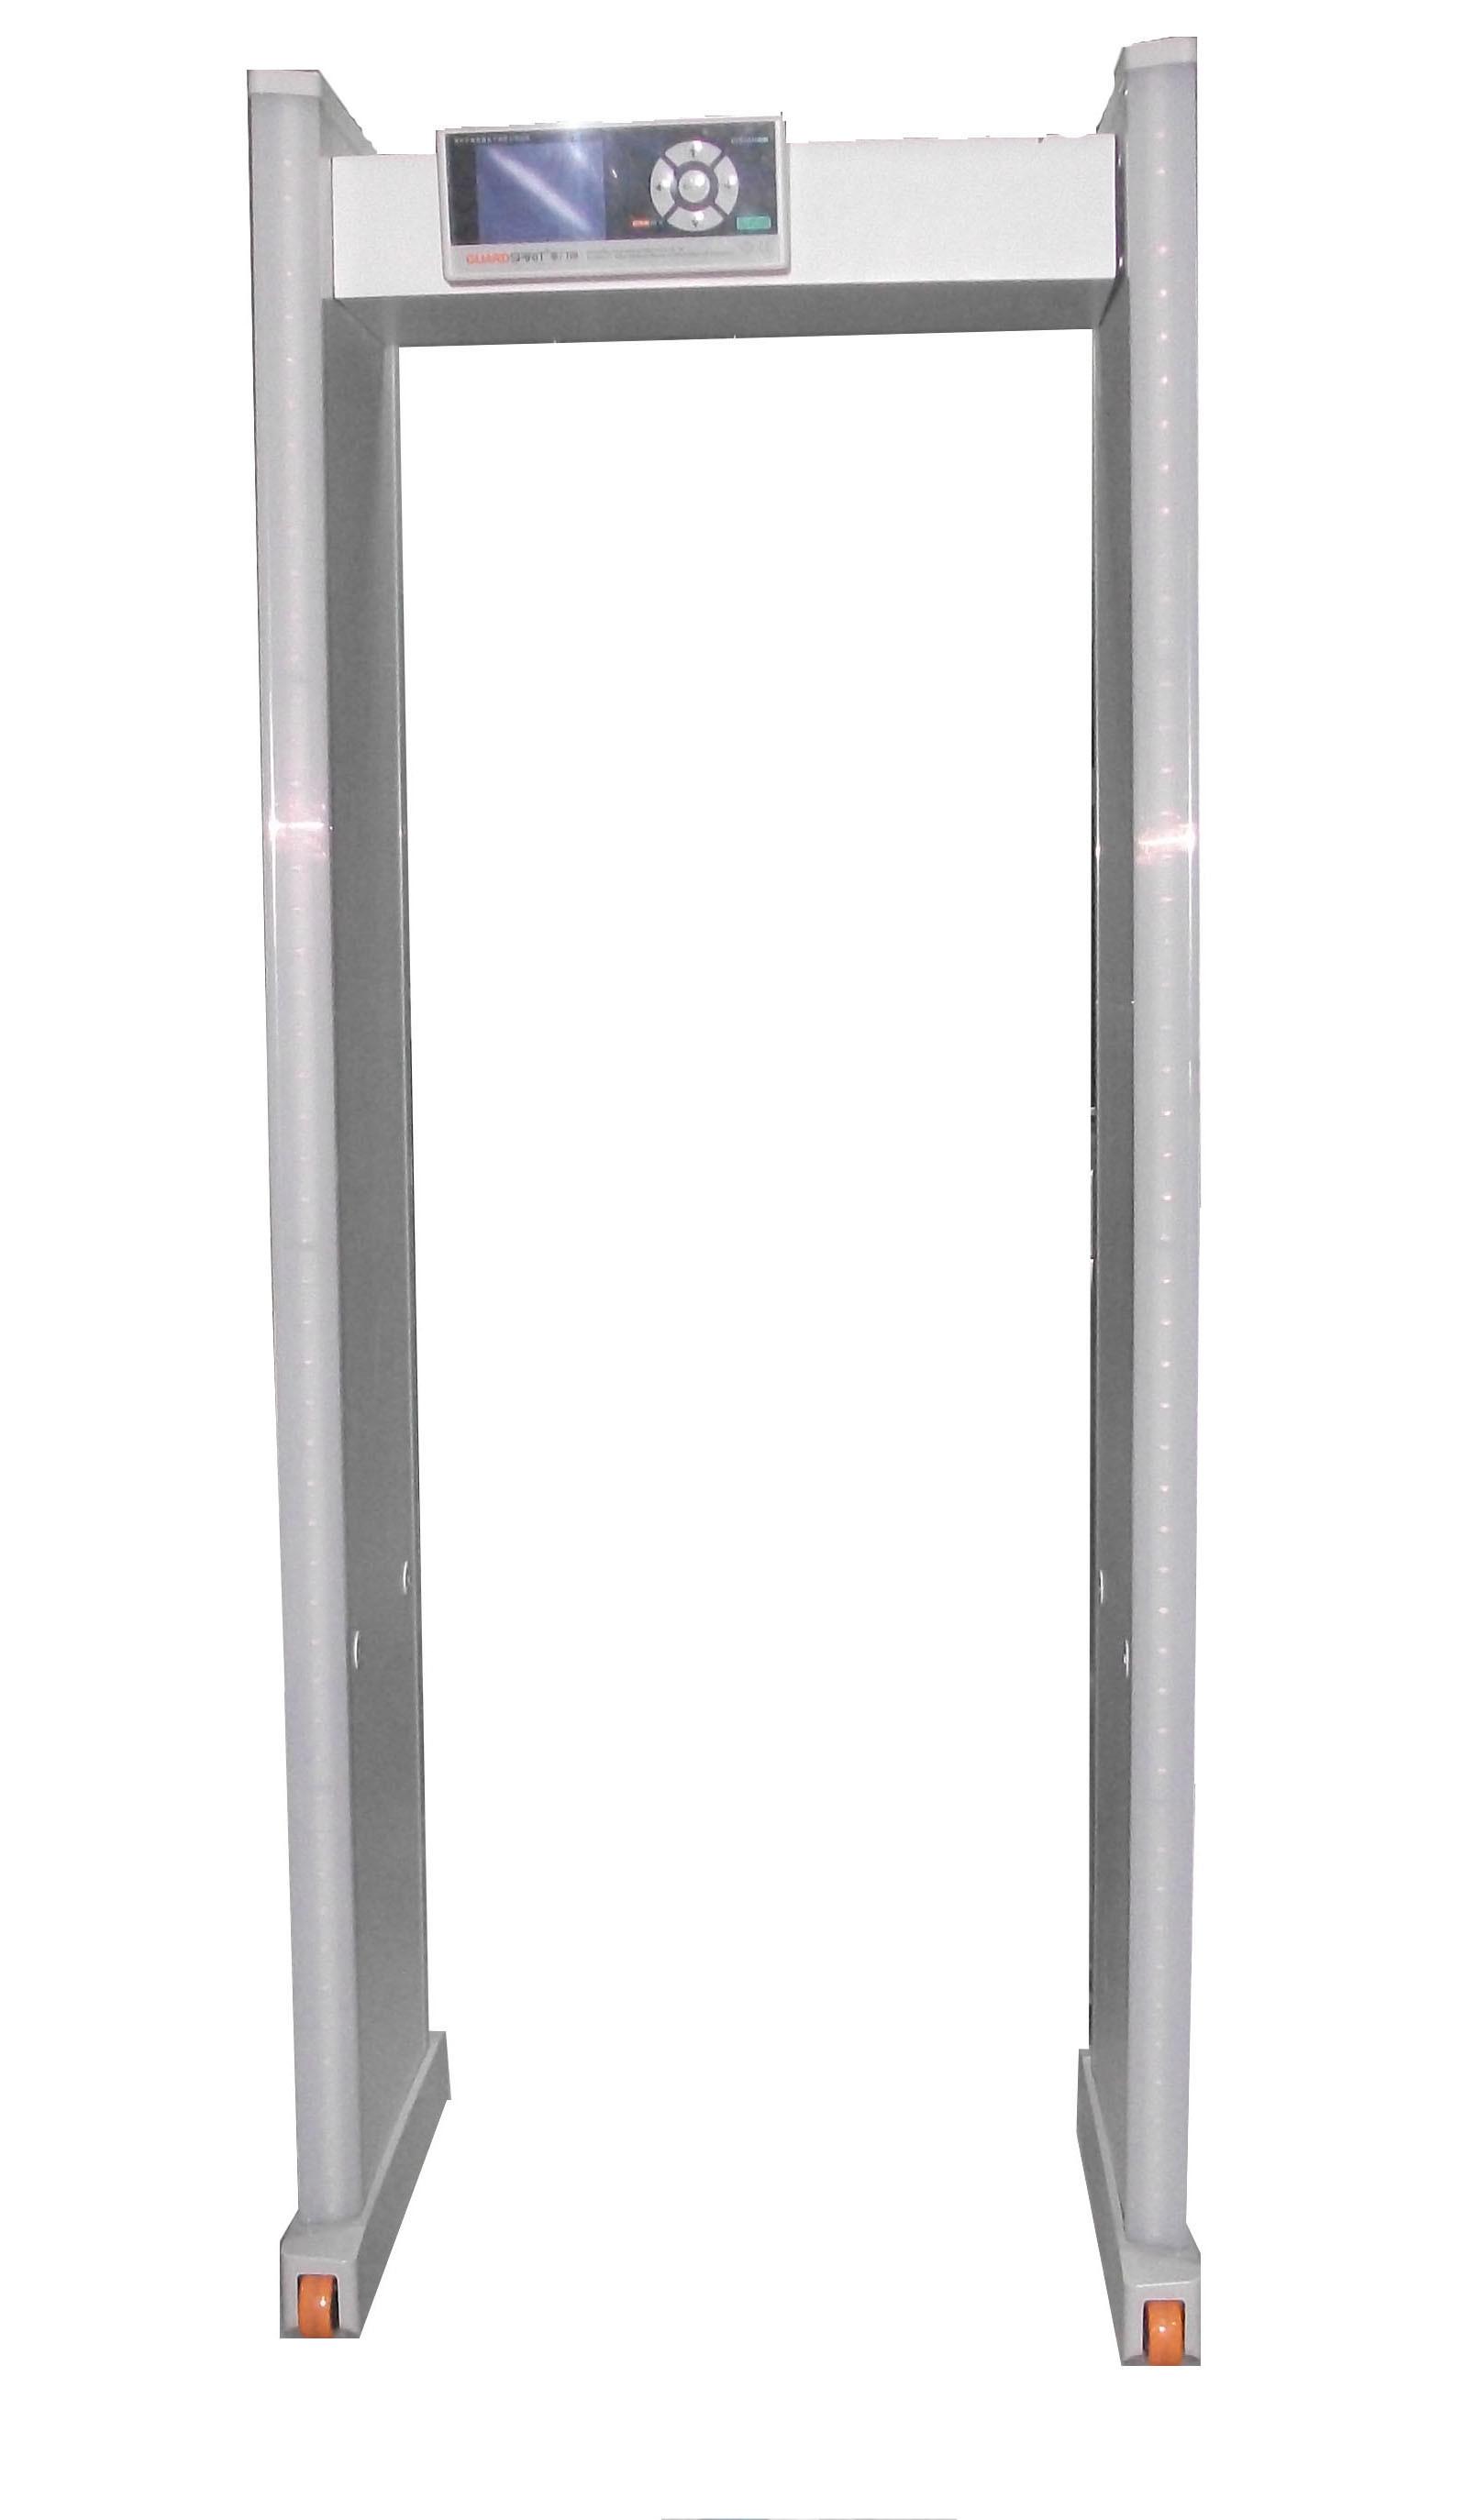 High Quality 24 Zones Walk Through Metal Detector Guardspirit Xyt2101b